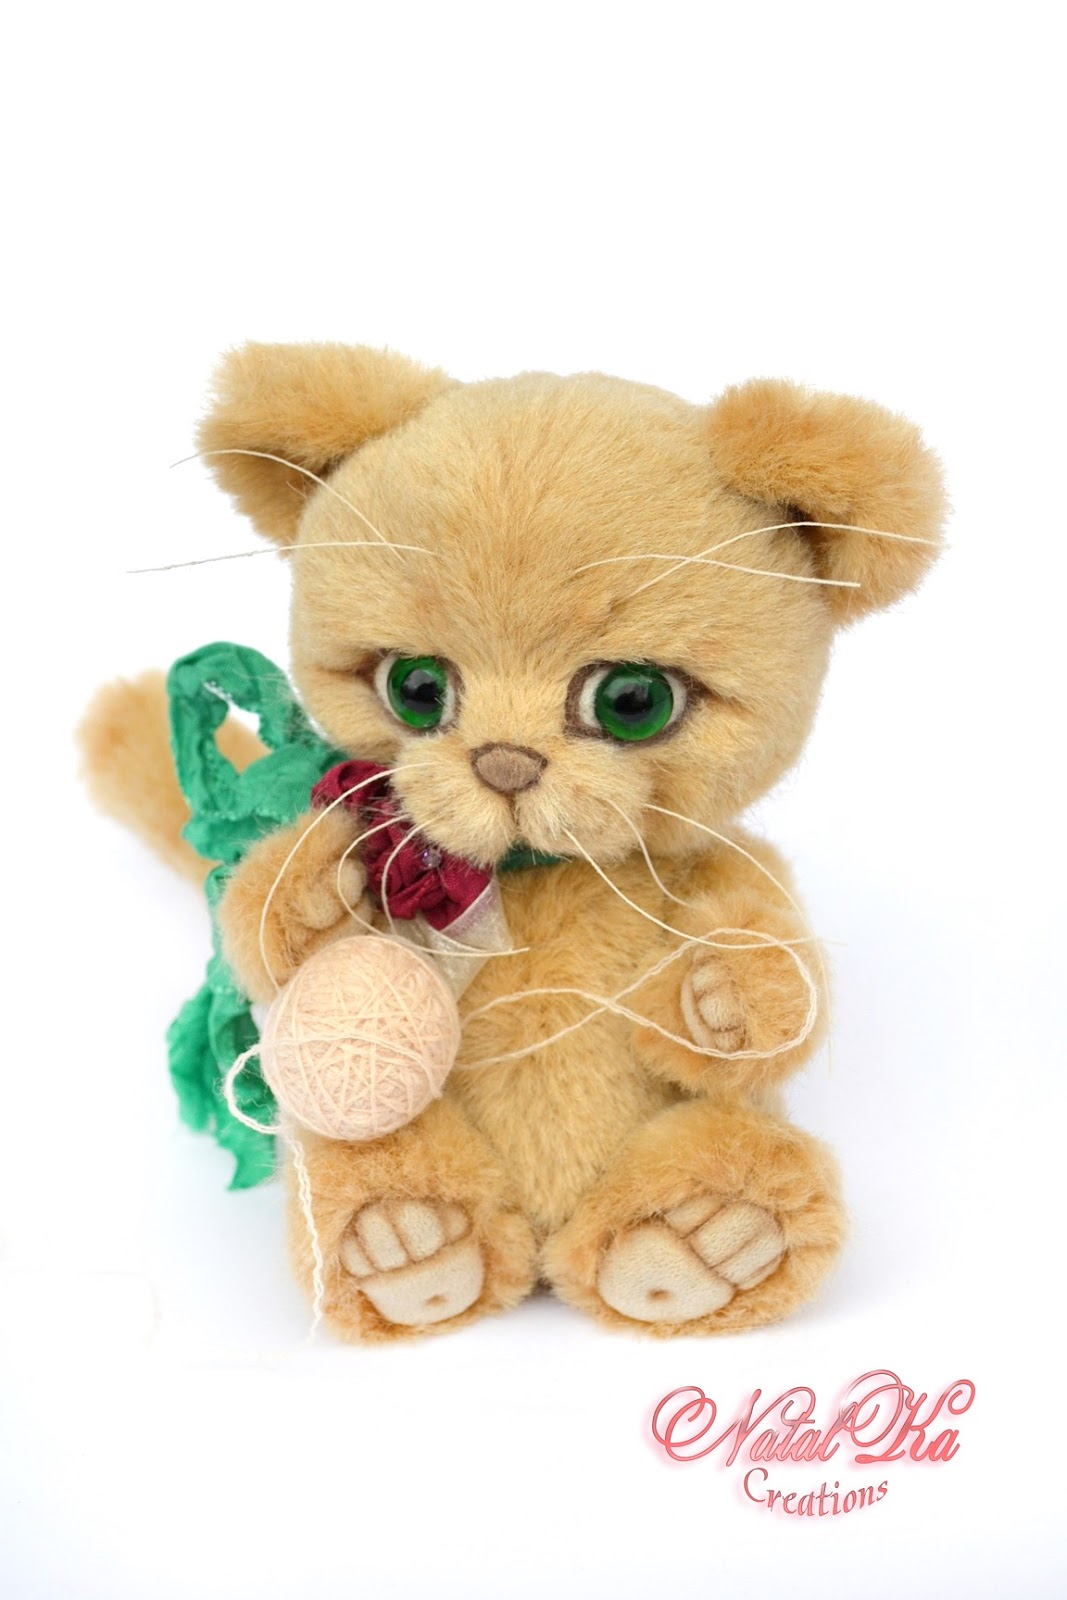 Artist teddy cat, kitty handmade, jointed, ooak, Künstlerteddy, Künstlerkater, Teddybär, handgemacht von NatalKa Creations